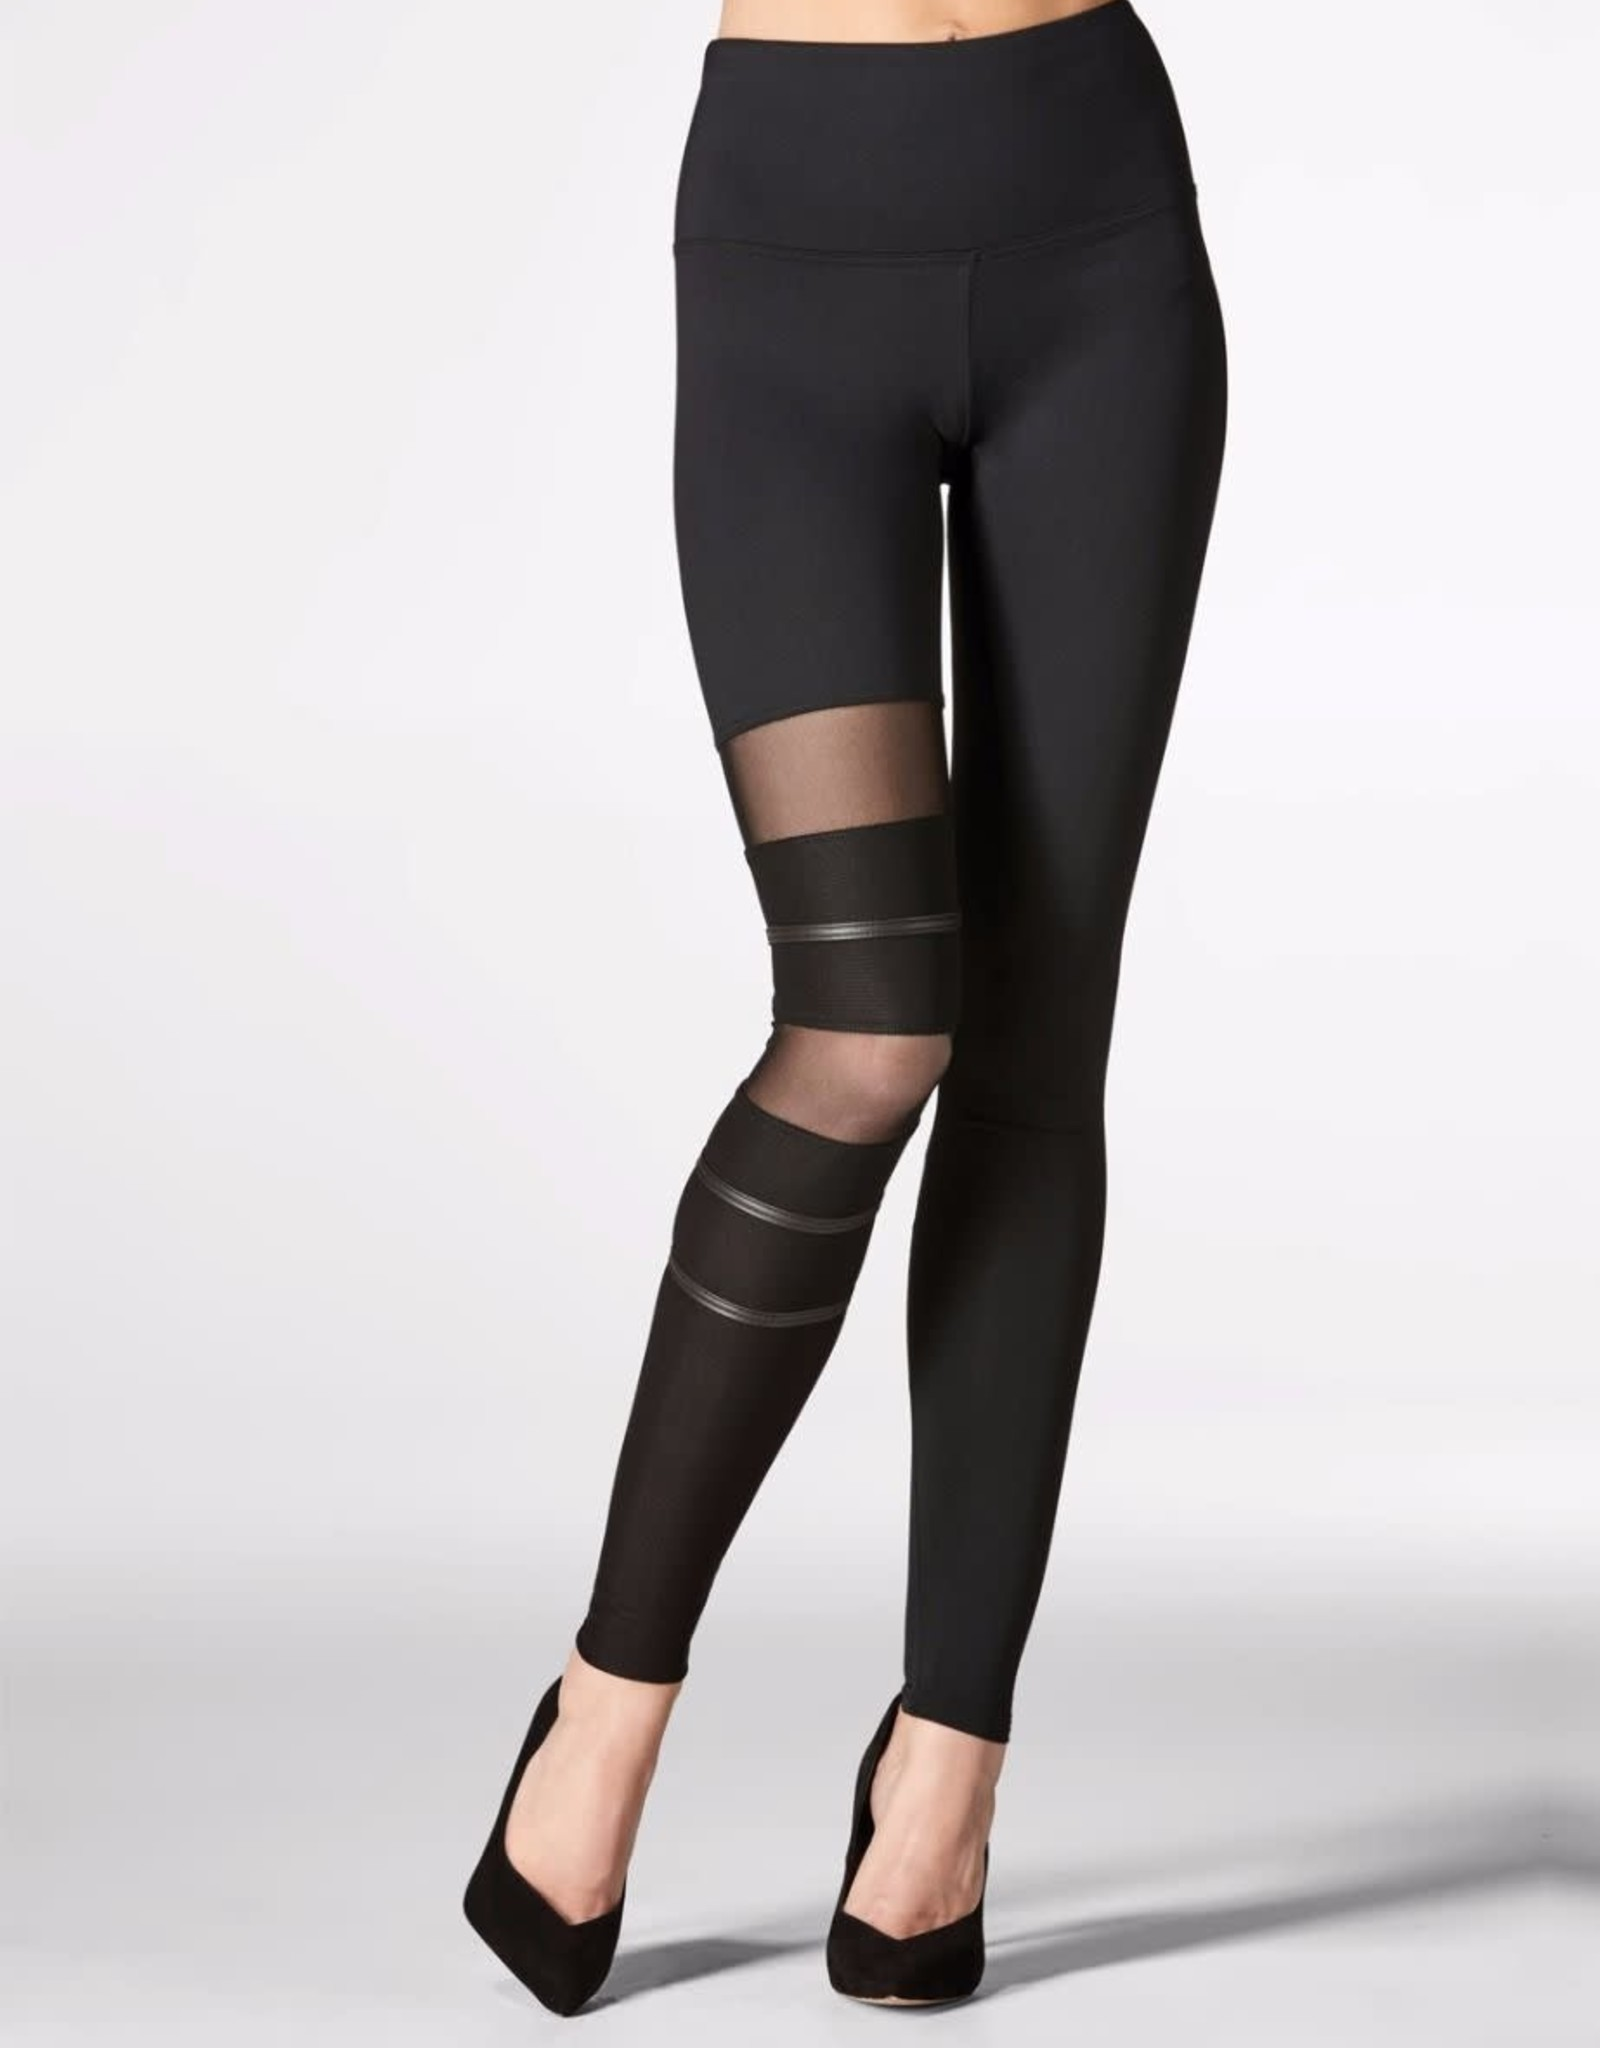 Mondor Fashion LEGGING LIGNES HORIZONTALES AD